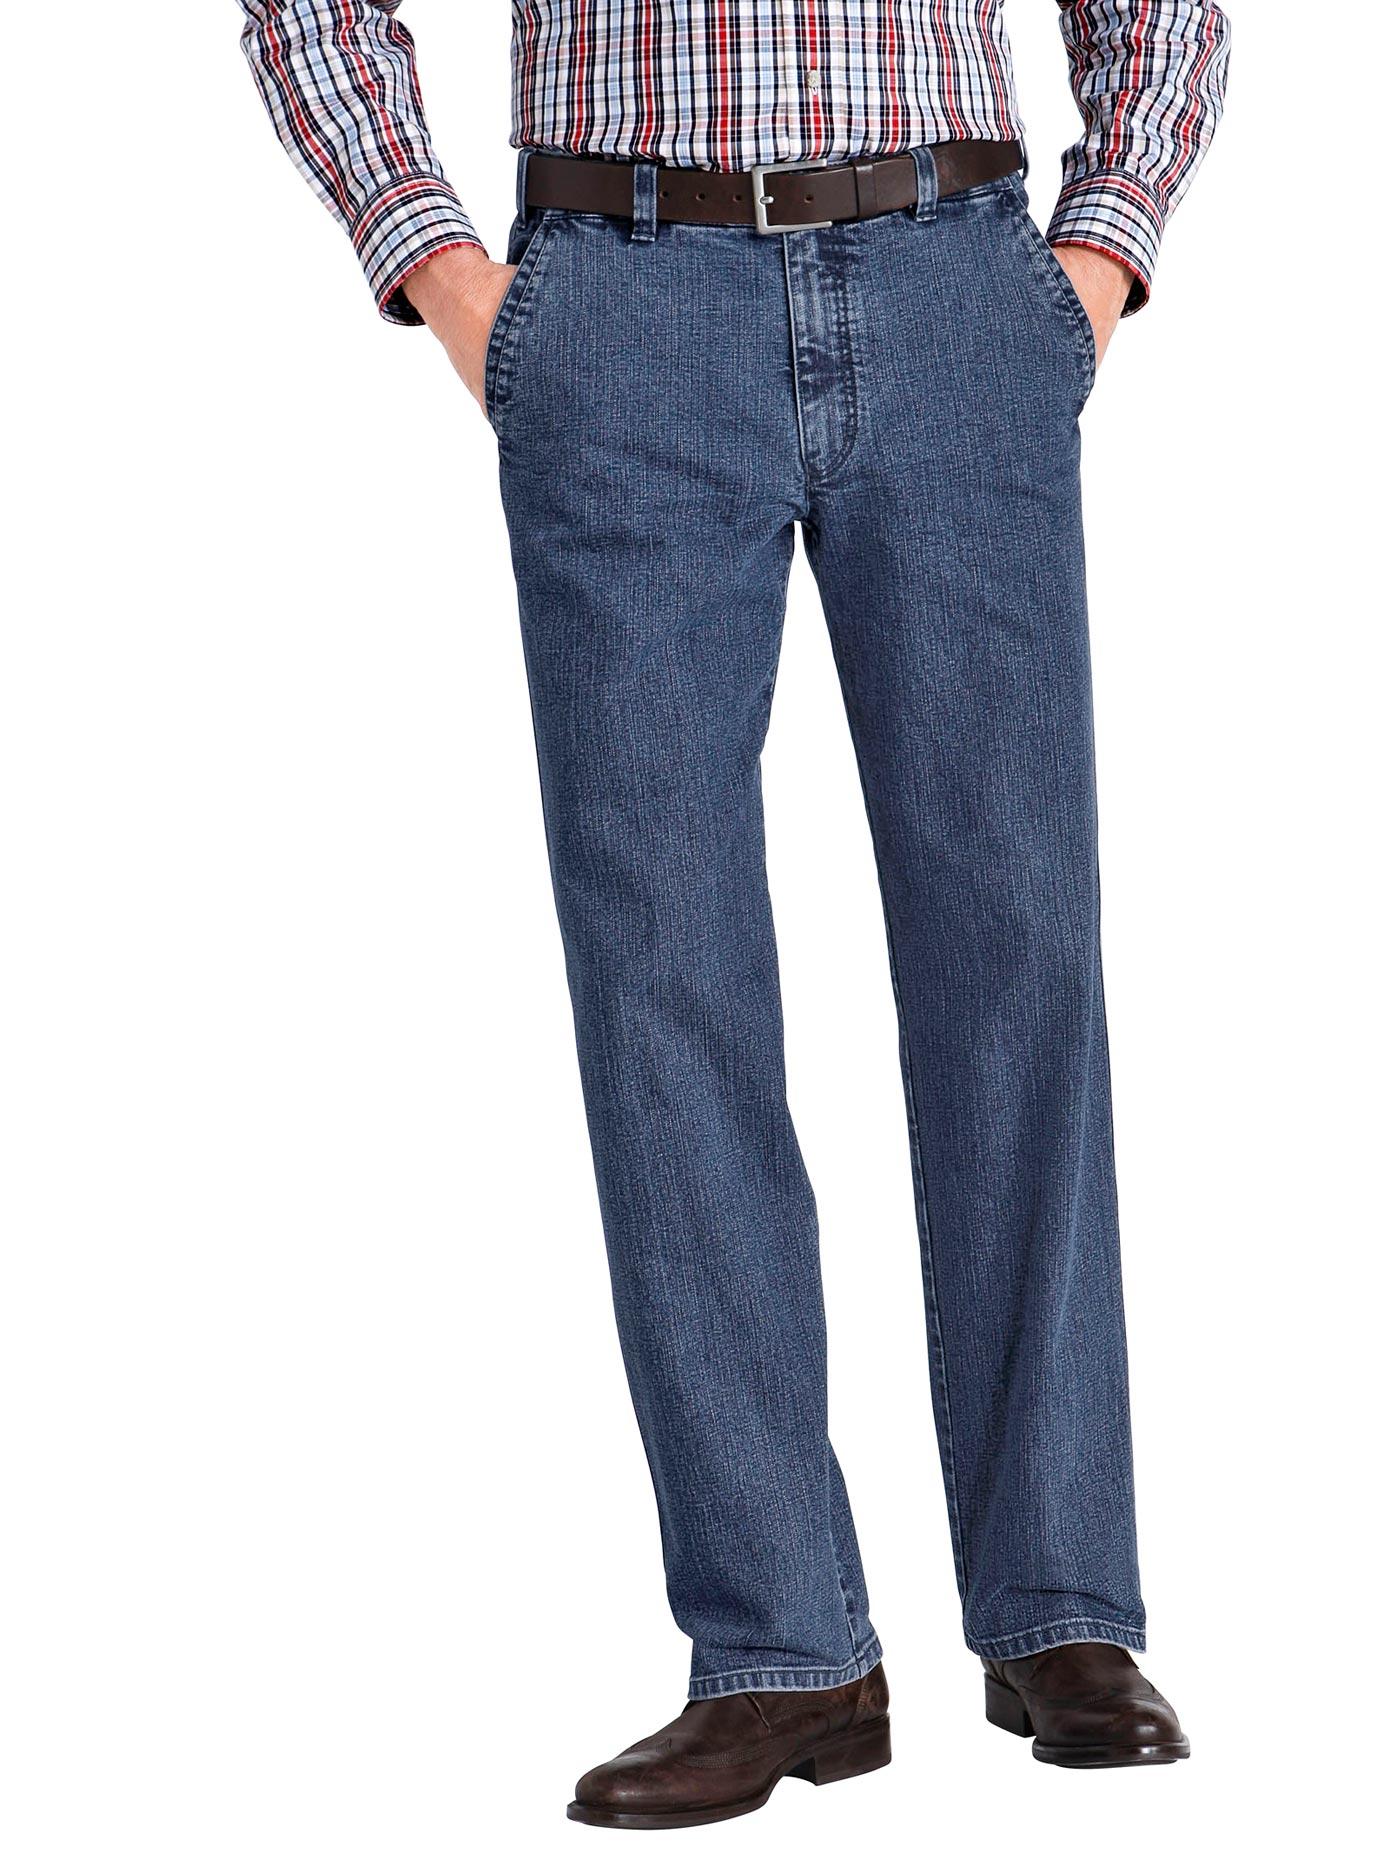 Brühl Traveller-Jeans in Stretch-Qualität | Bekleidung > Jeans > Sonstige Jeans | Blau | Jeans | BRÜHL